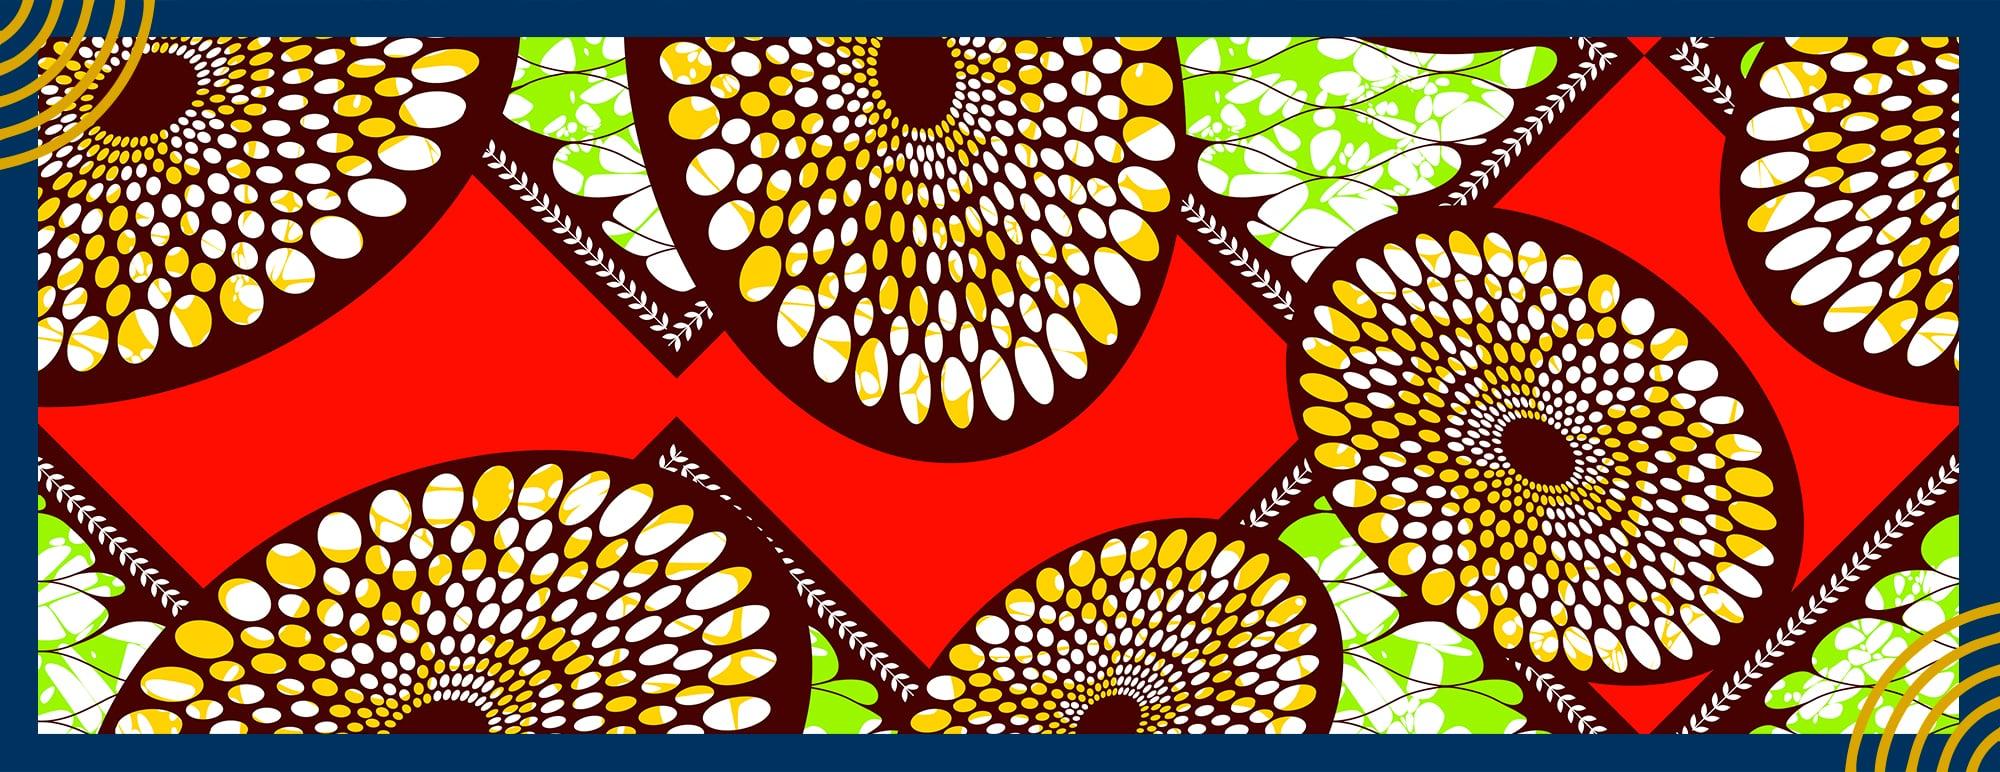 AOSSY-actualite-accueil-motif-couleurs